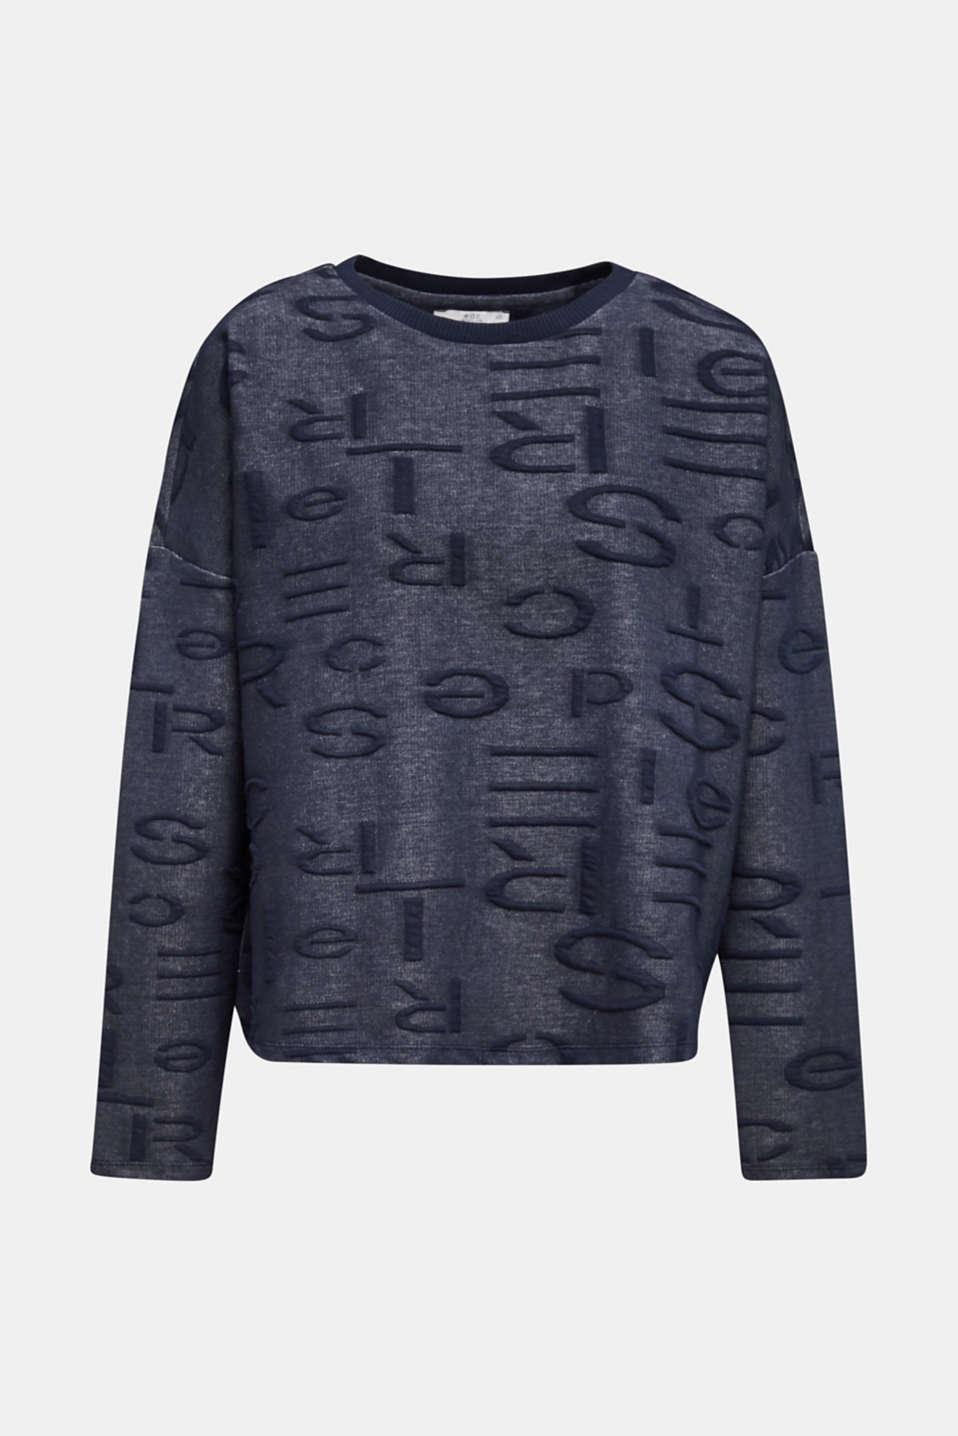 Sweatshirt with a logo jacquard pattern, NAVY, detail image number 5